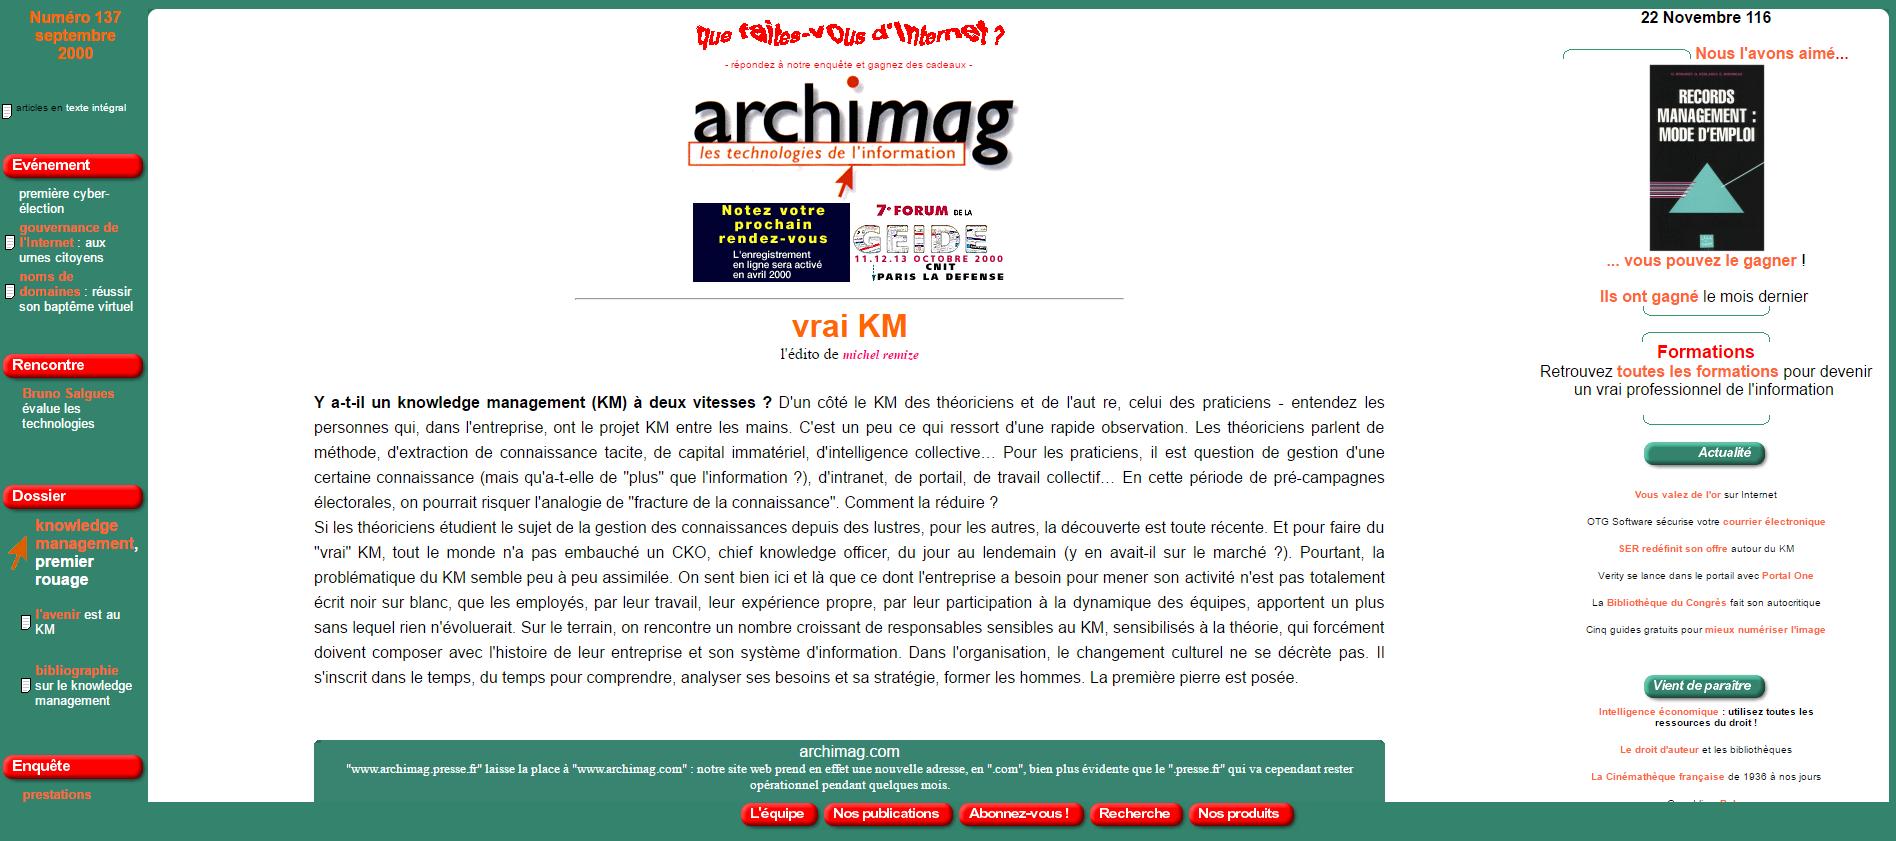 Archimag_2000